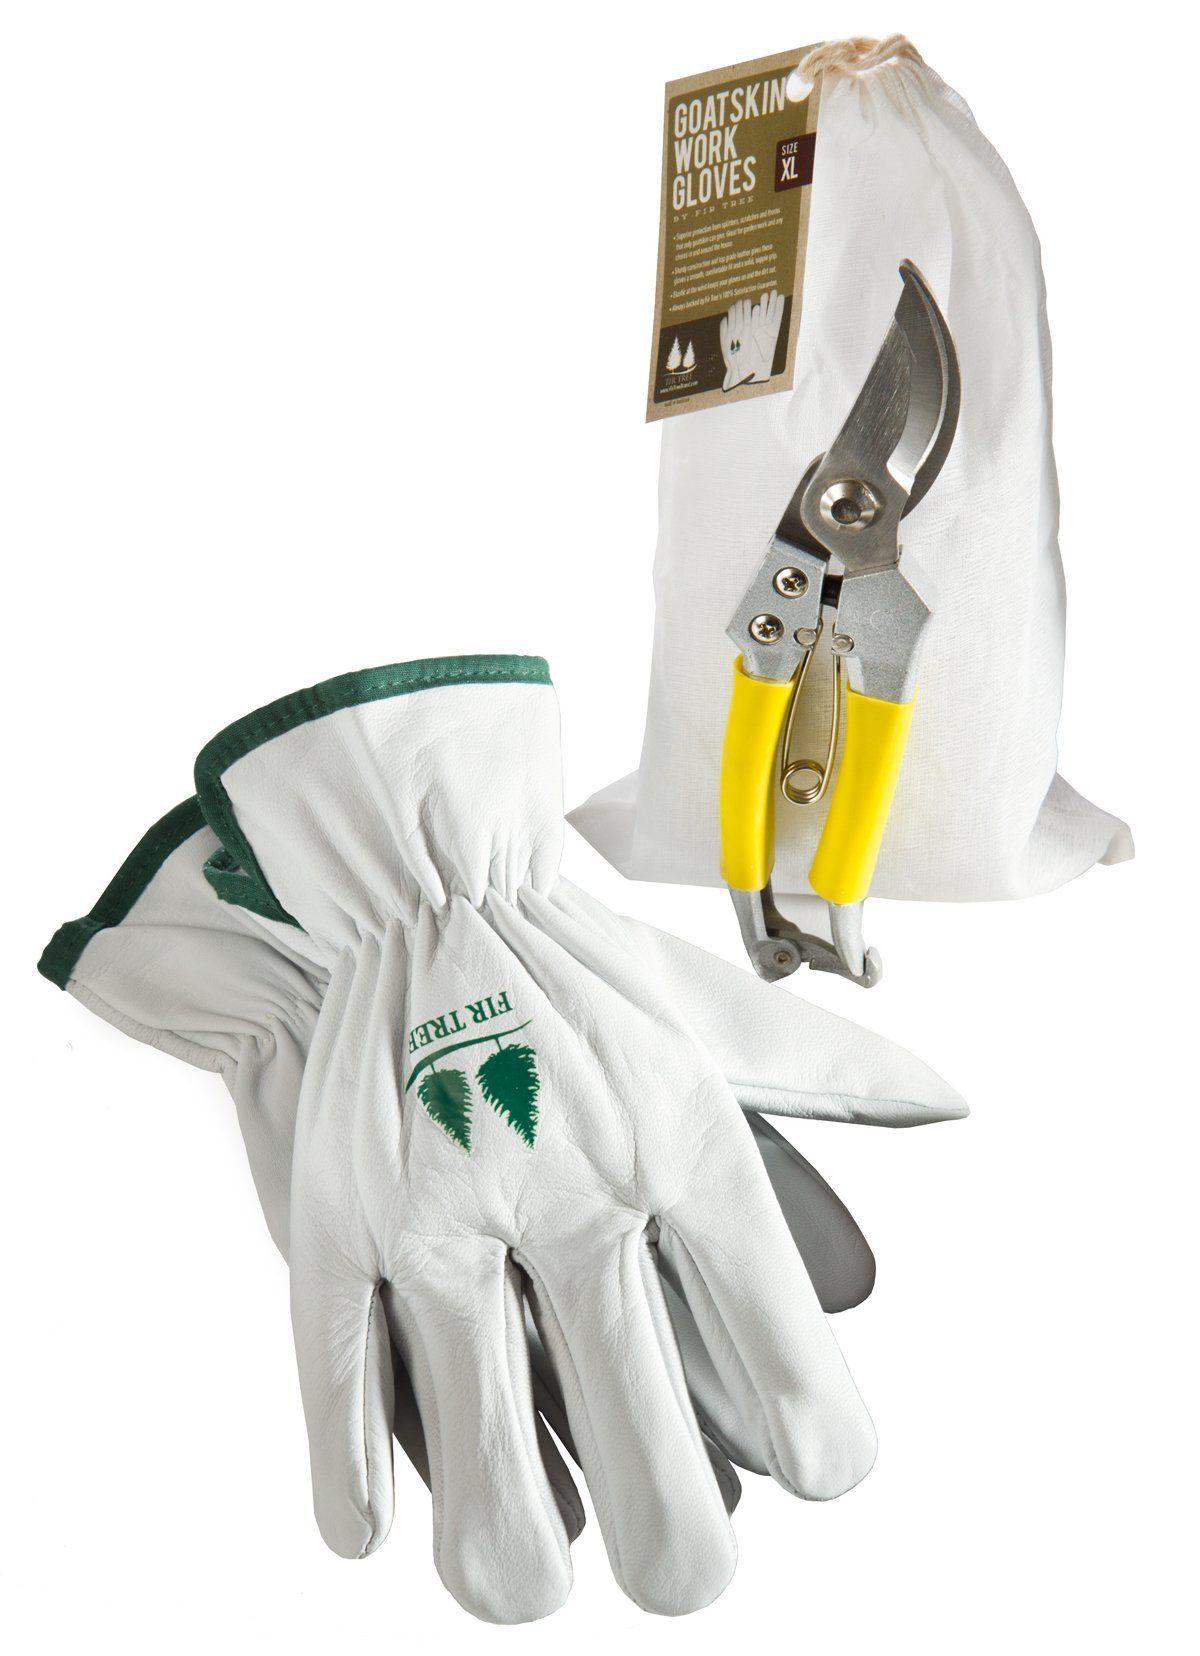 Goatskin leather work gloves - Gardening Tools Set By Fir Tree Goatskin Leather Work Gloves And Stainless Steel Bypass Pruners